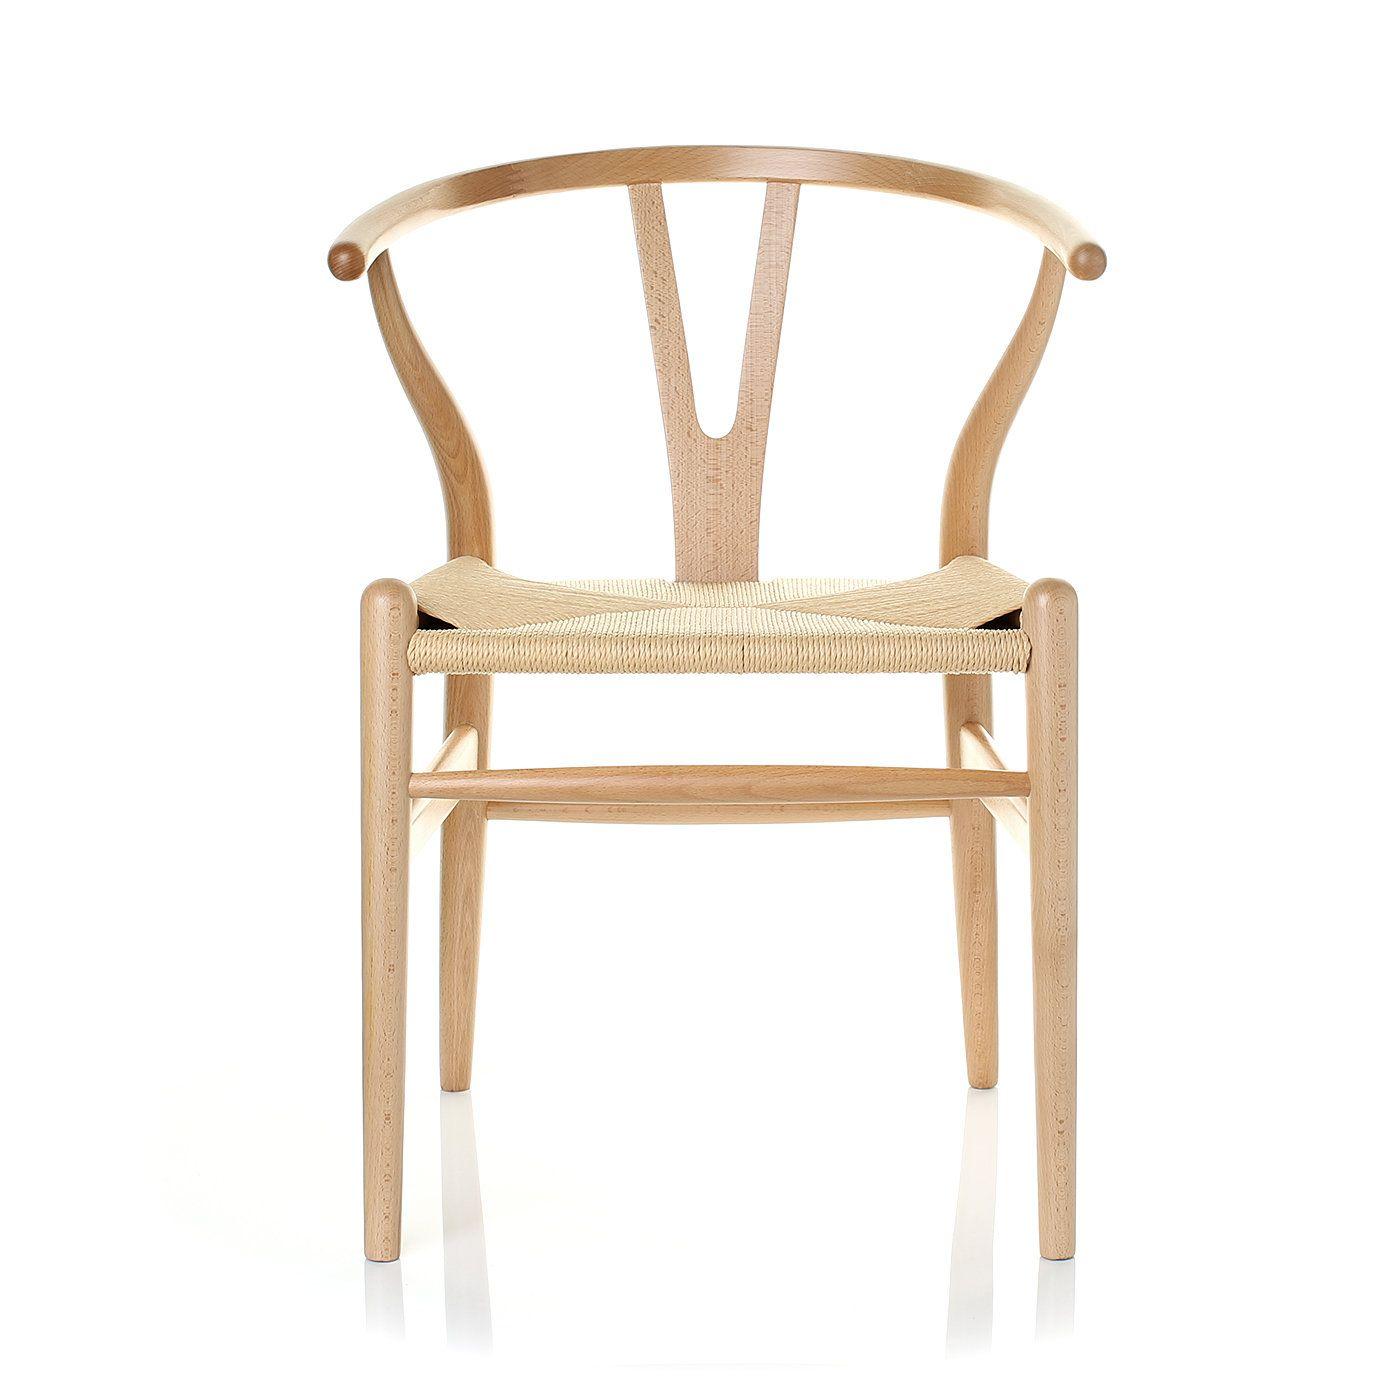 Hans j wegner ch24 wishbone y chair style side chairs